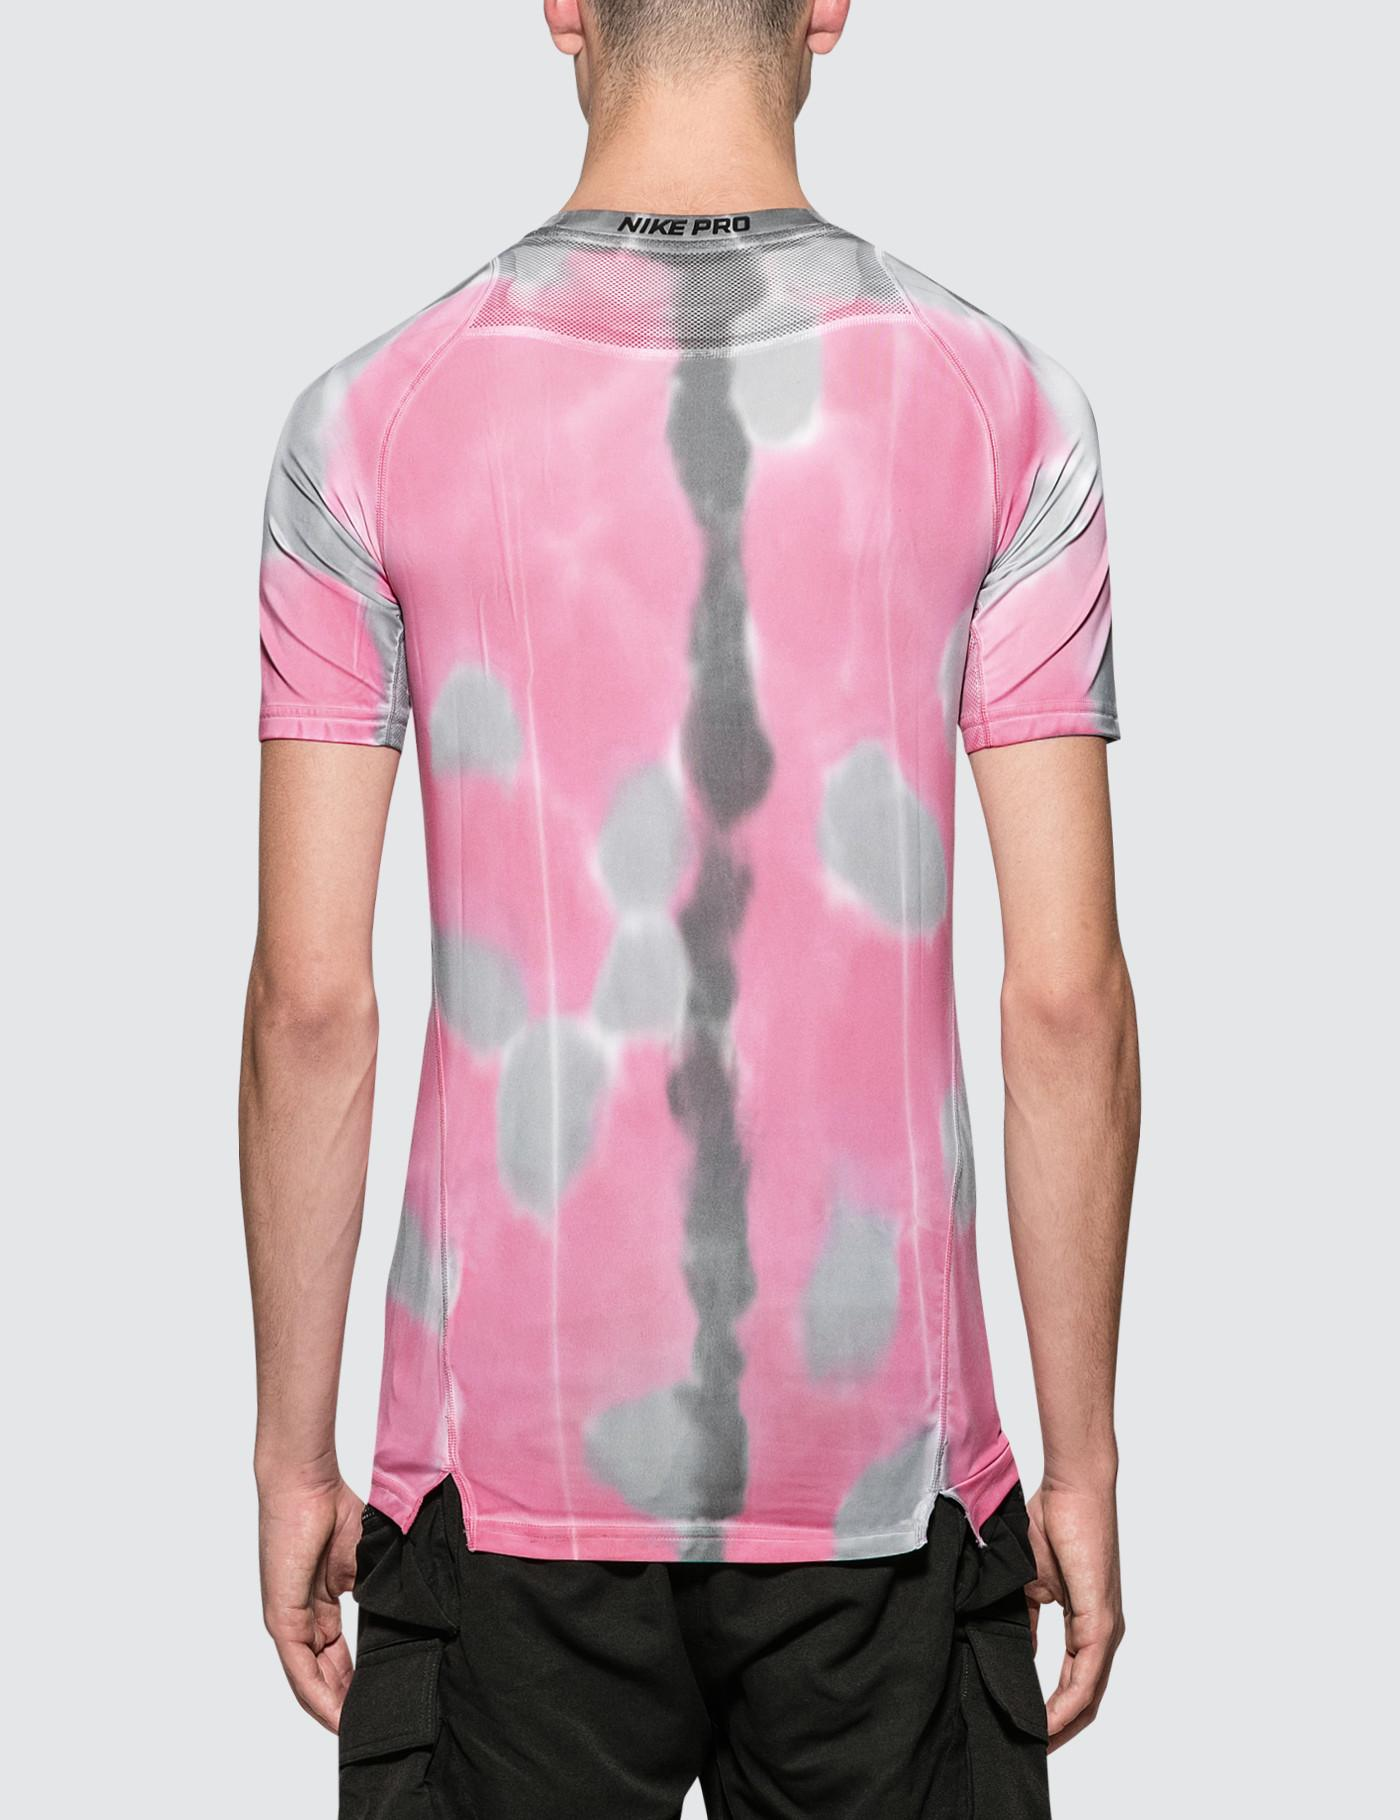 508d88b8b2b 1017 ALYX 9SM X Nike T-shirt in Pink for Men - Save 2% - Lyst